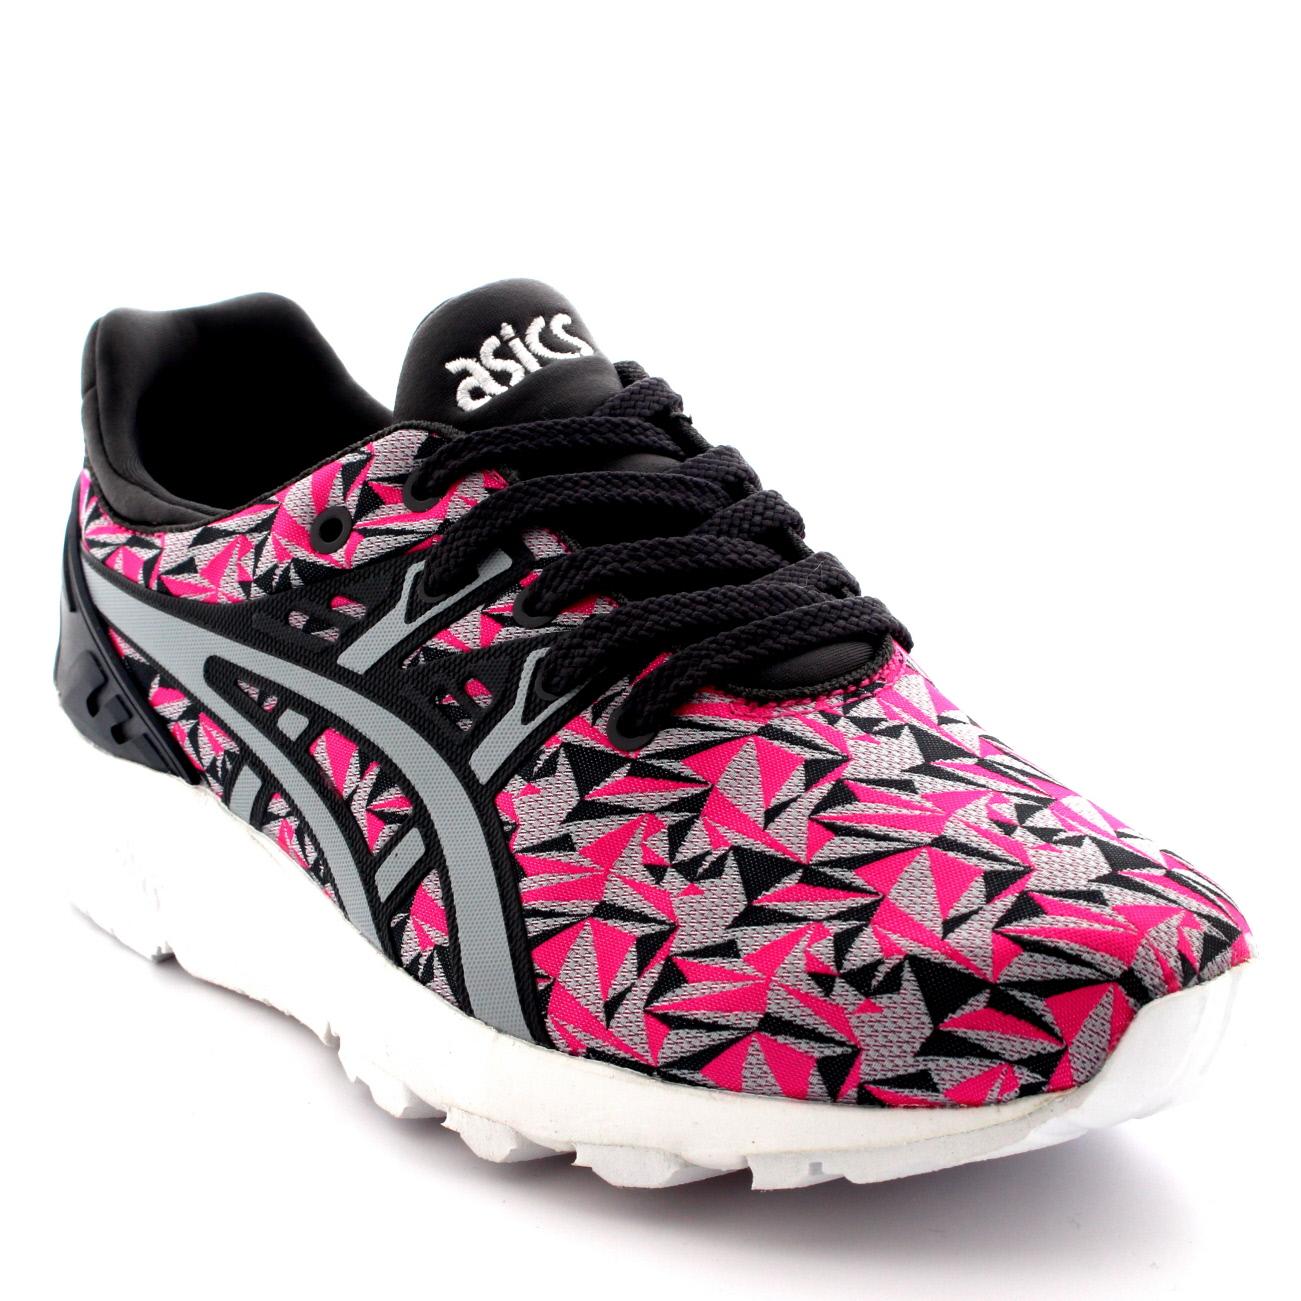 Unisex Adults Asics Gel Kayano Evo Running Walking Lightweight Trainers UK 3-12